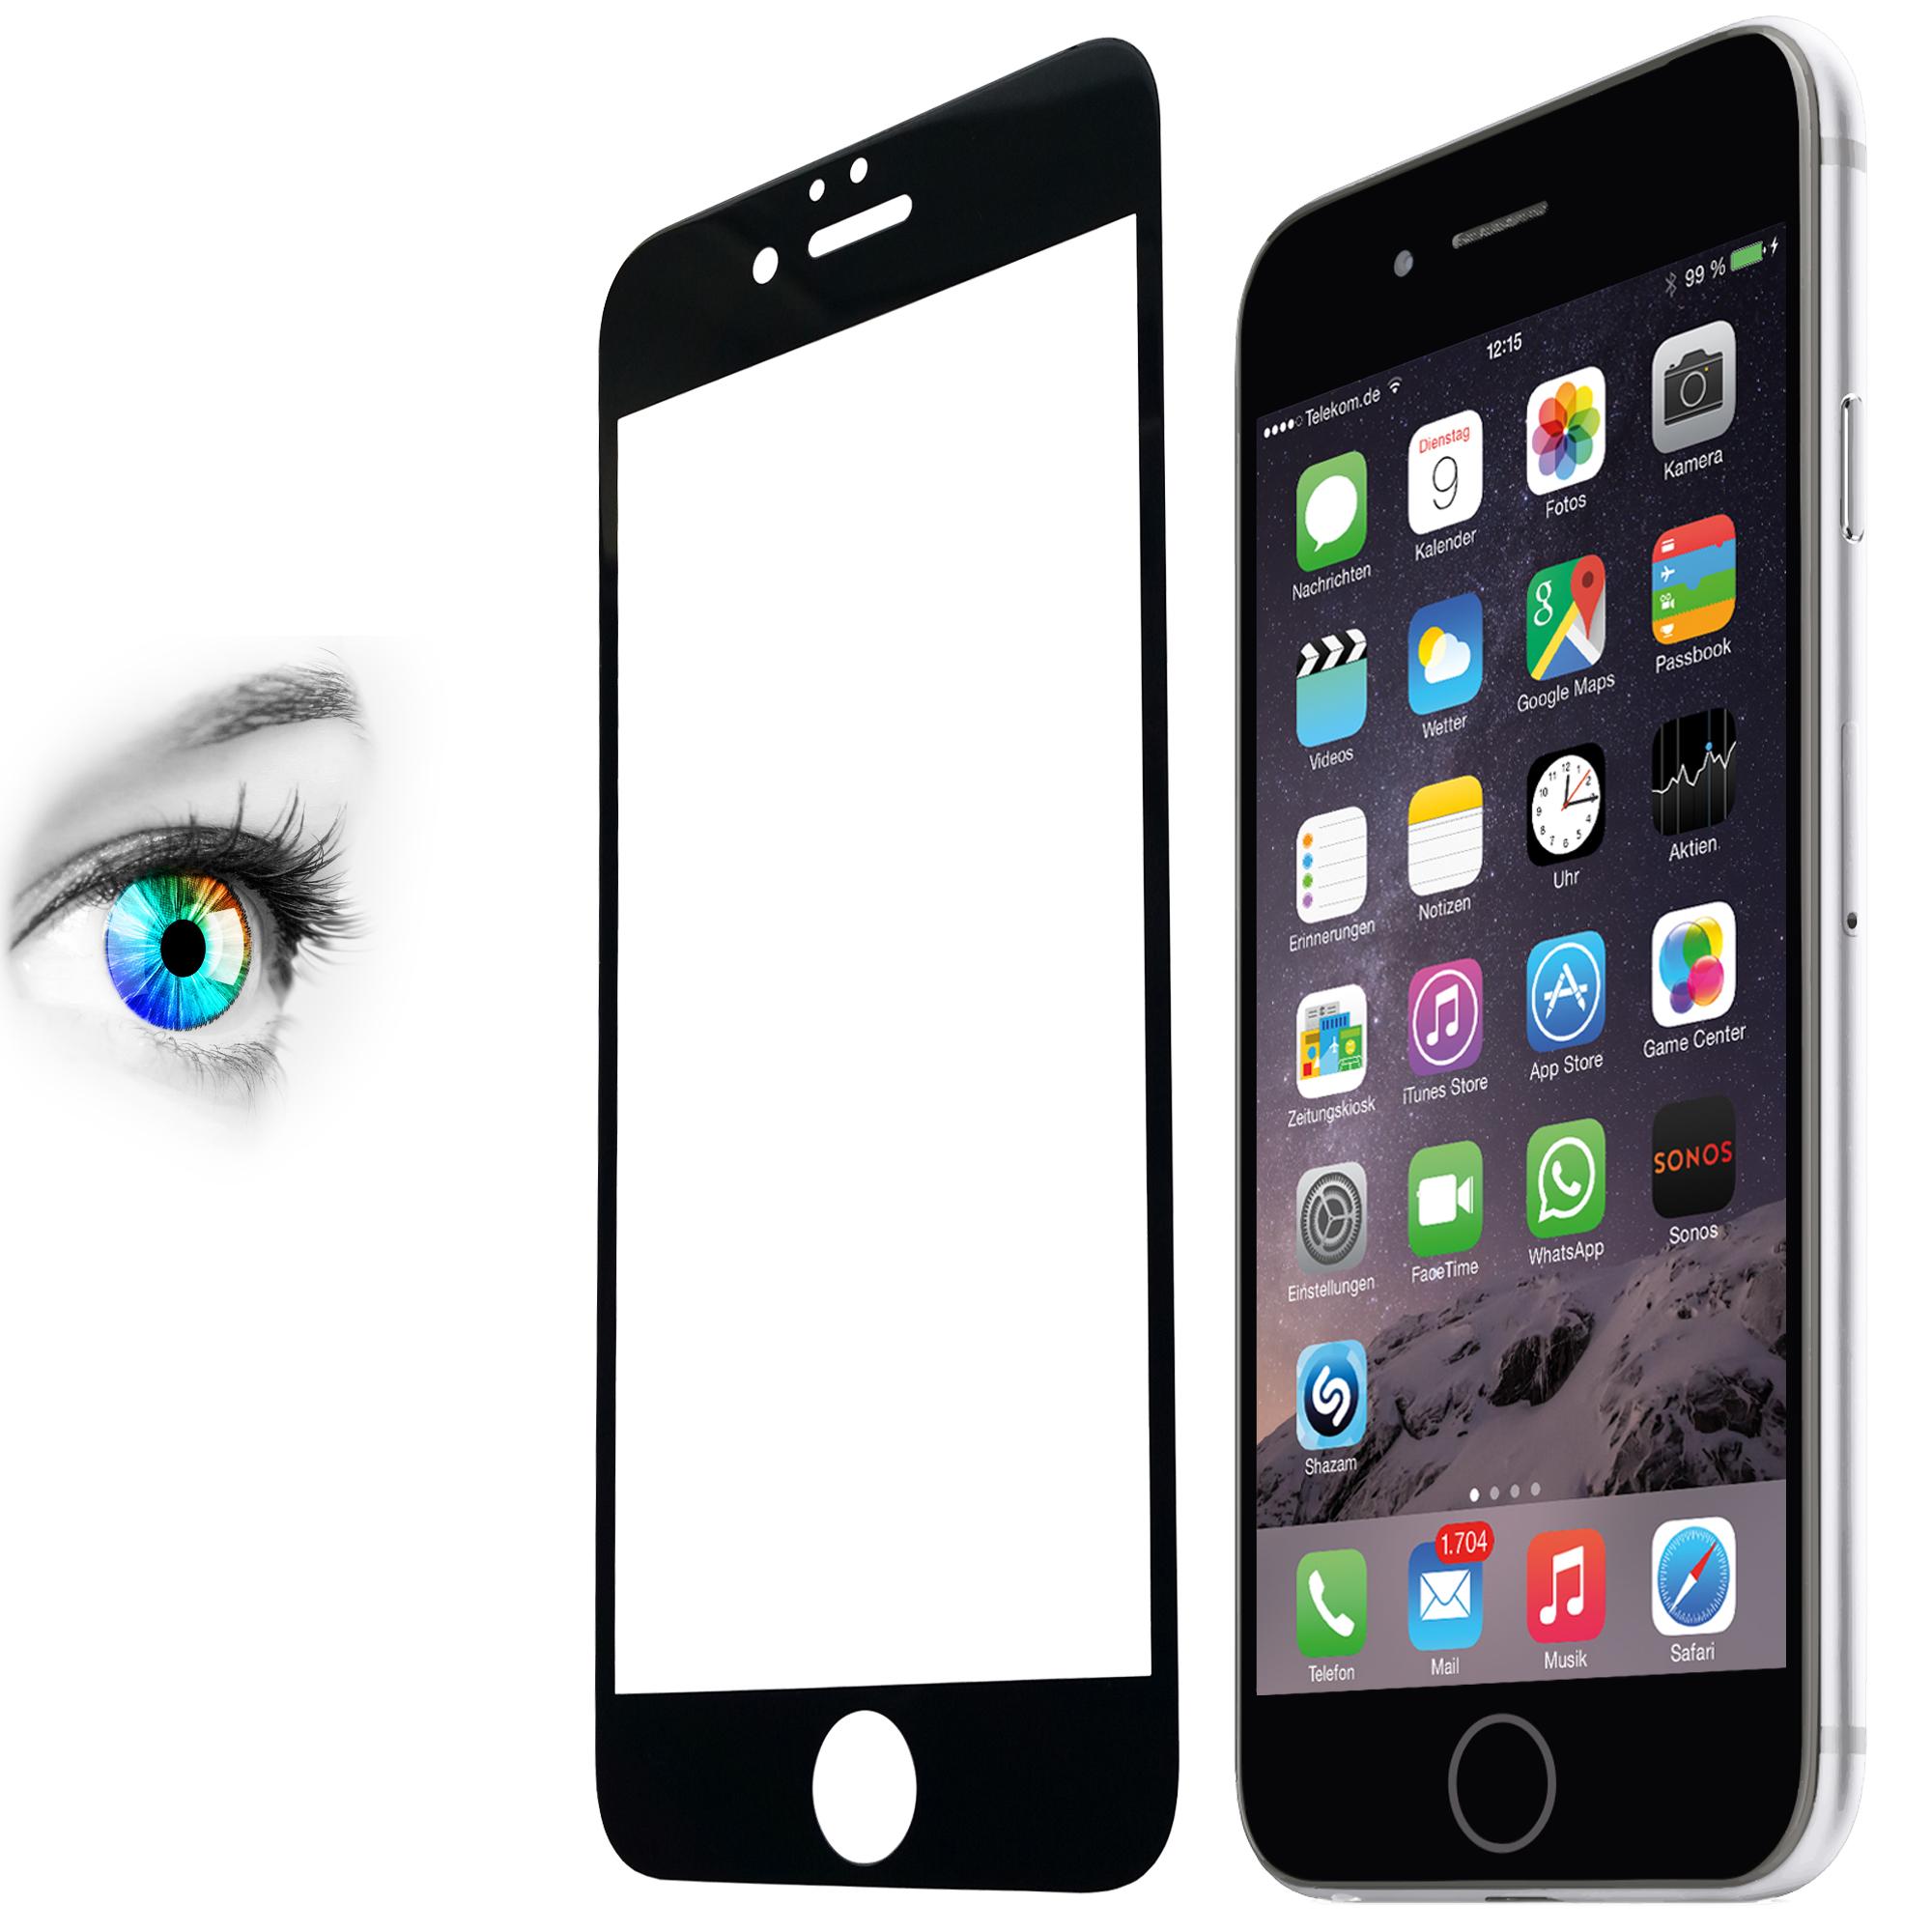 apple iphone 6 iphone 6 plus iphone 6s 6s plus. Black Bedroom Furniture Sets. Home Design Ideas